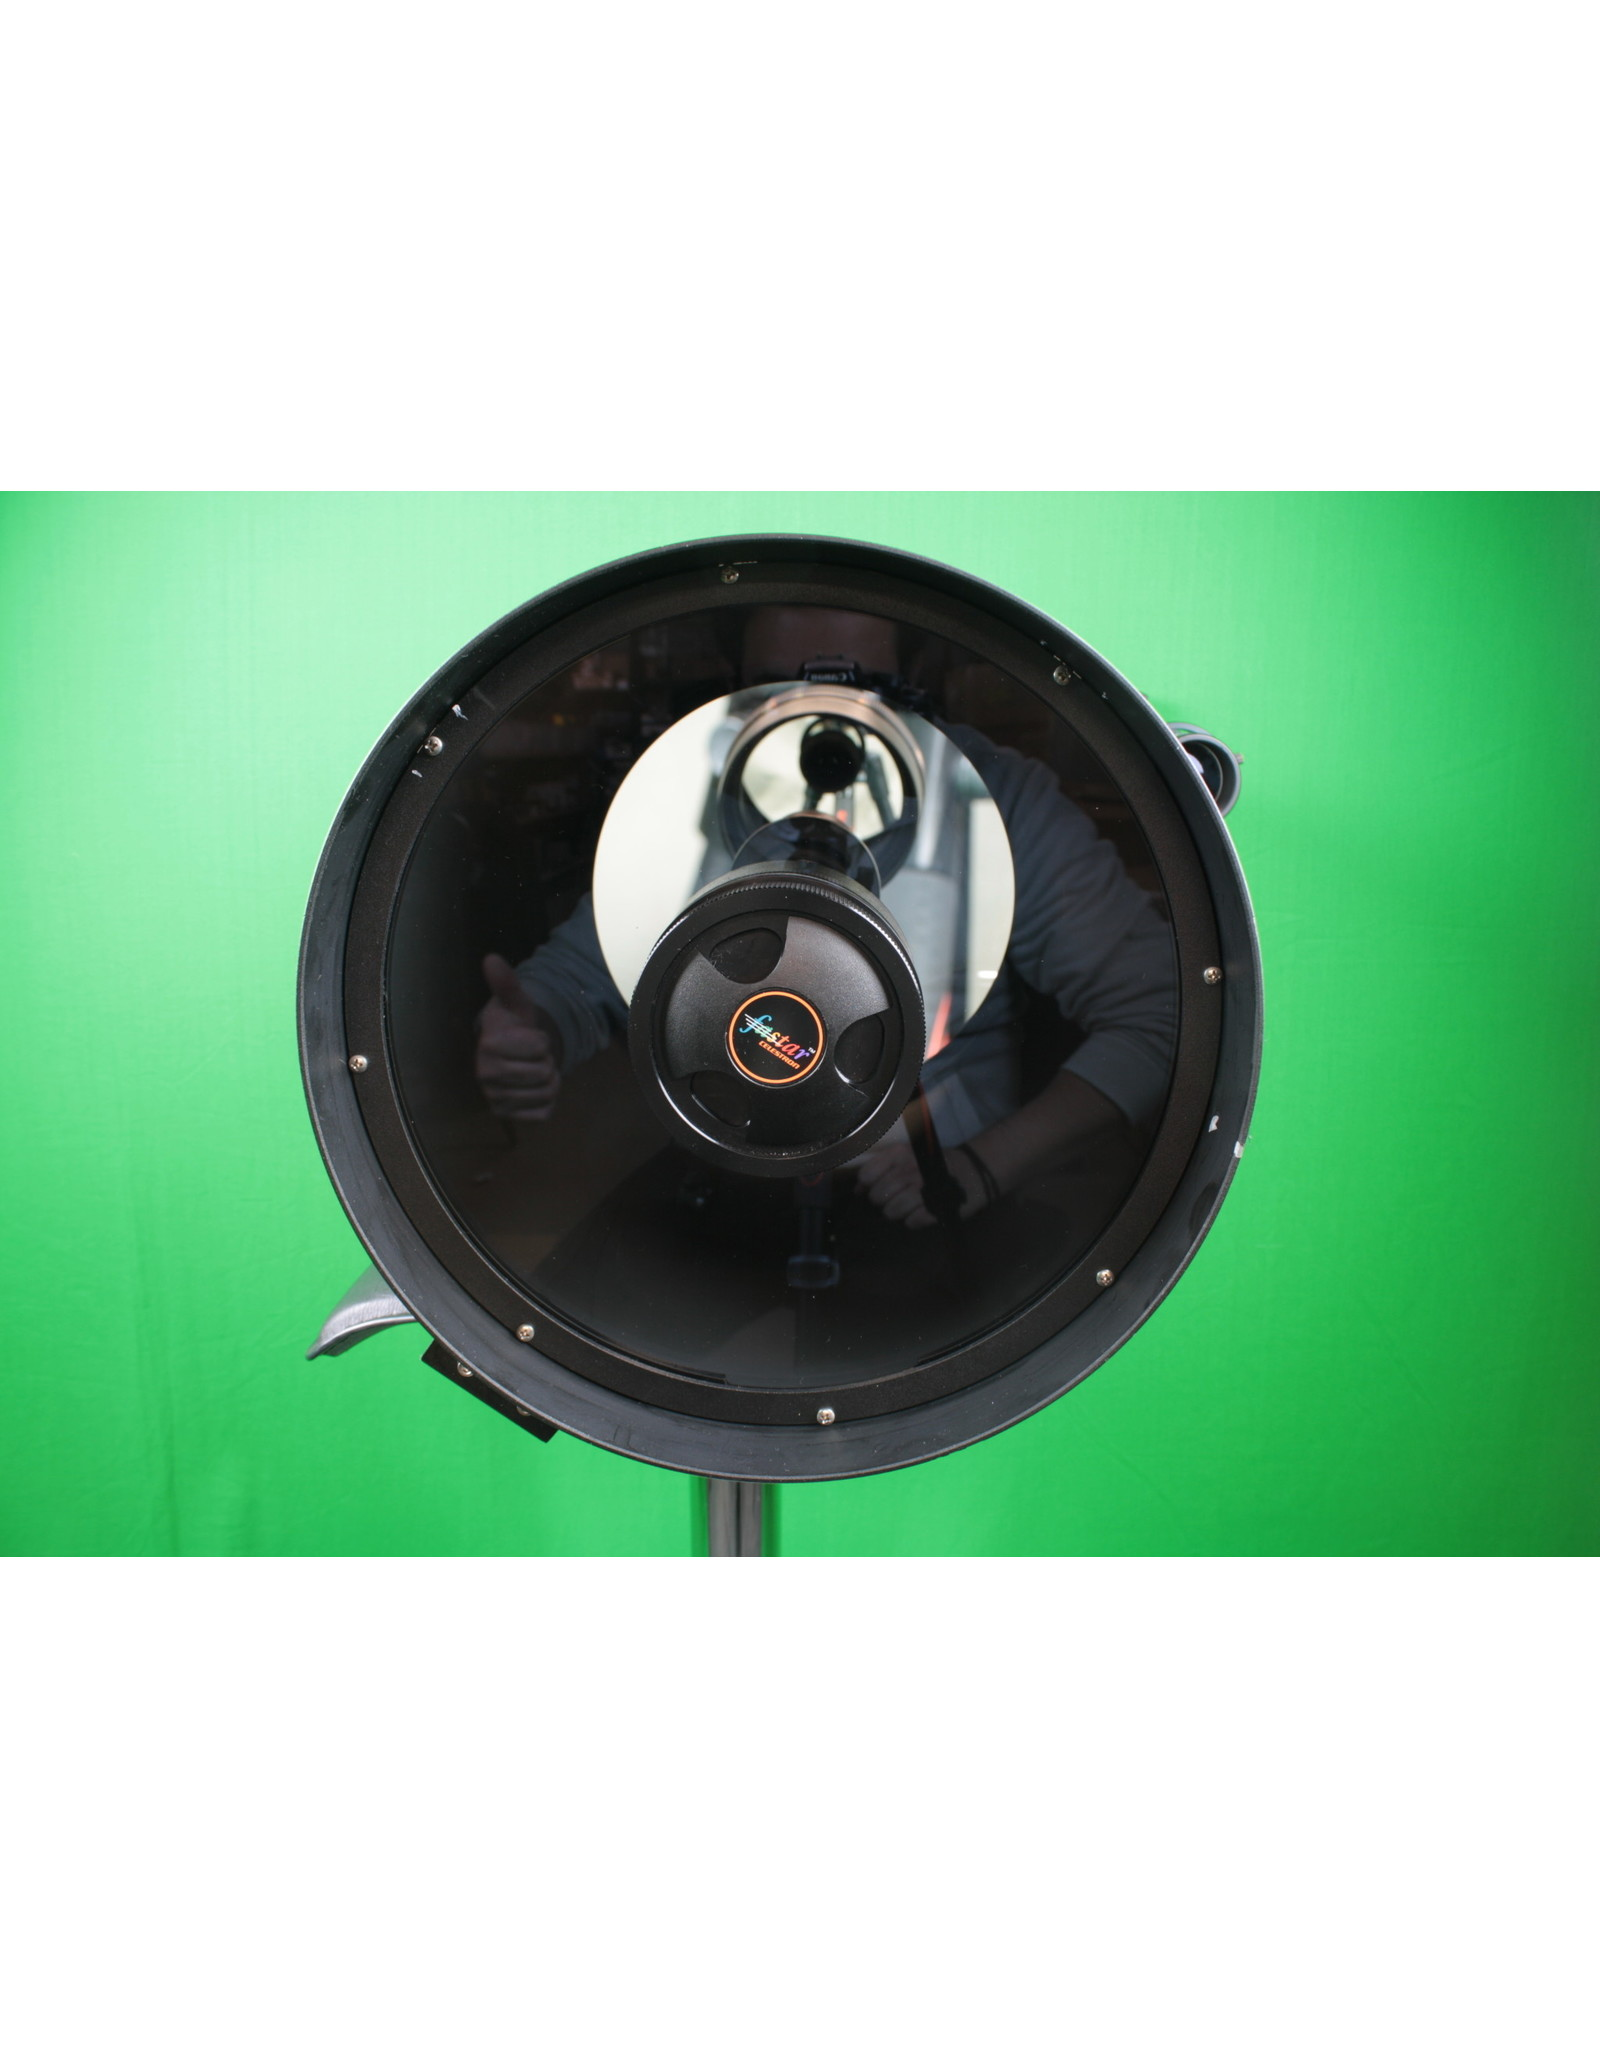 Celestron C11 Carbon Fiber OTA (Fastar Compatible)  (Pre-owned)